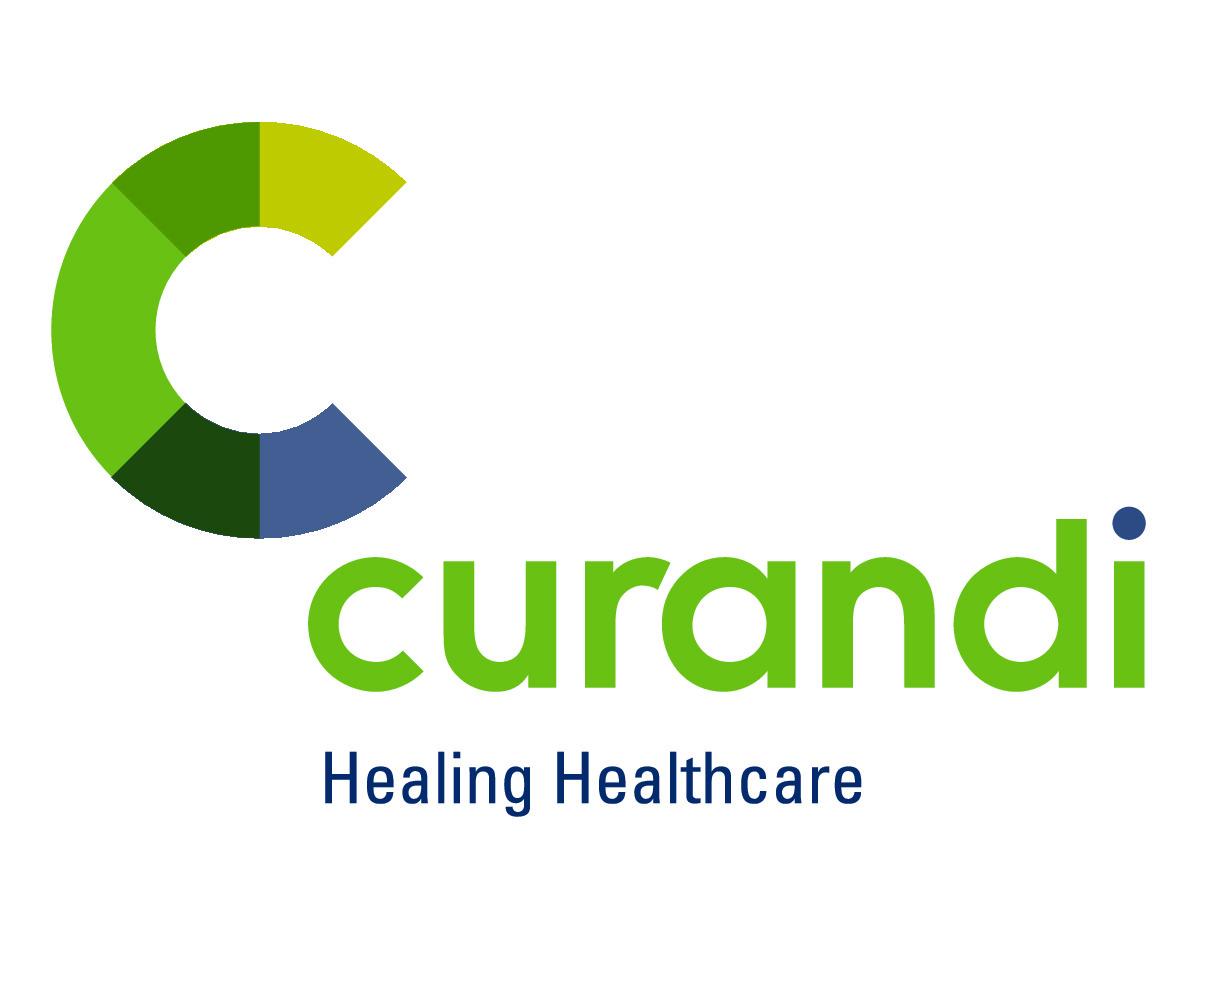 Curandi-logo-vector